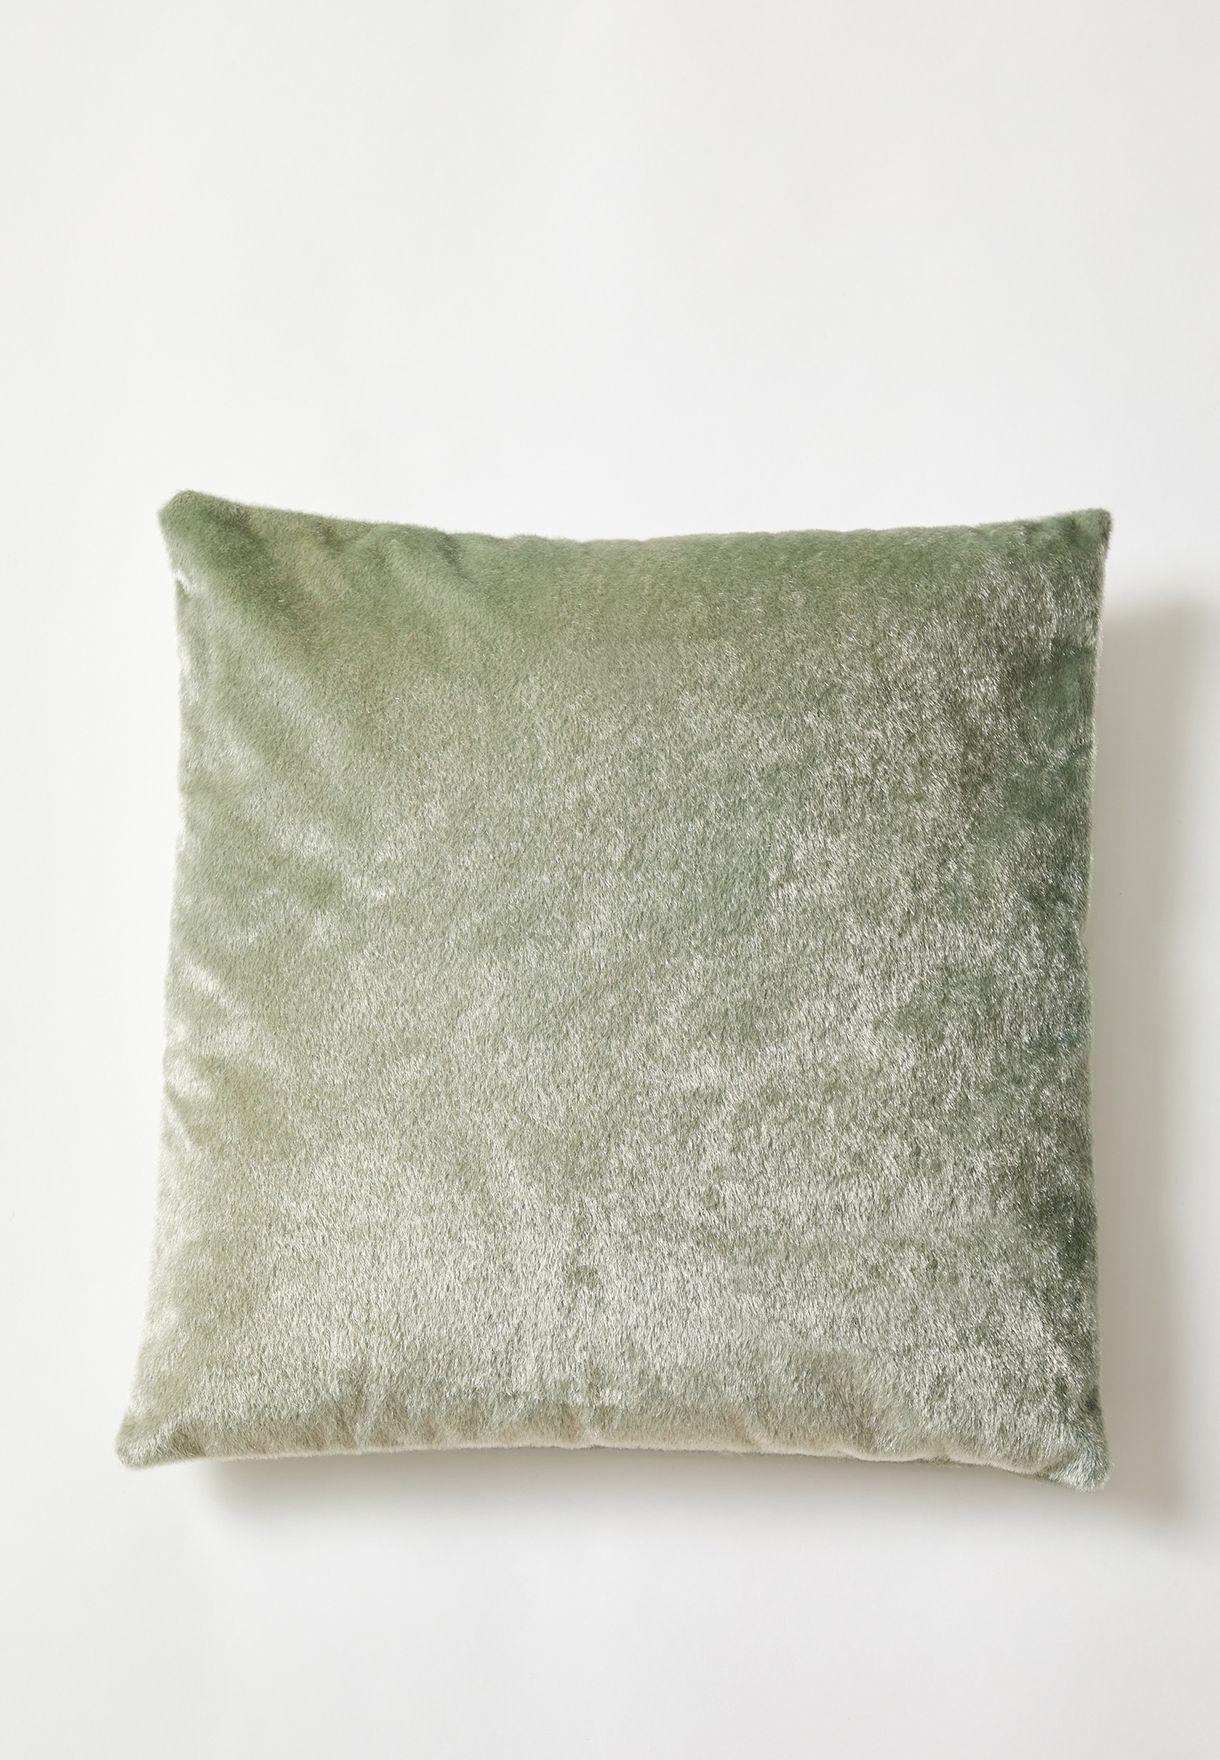 Green Faux Pony Fur Cushion With Insert 45x45 cm